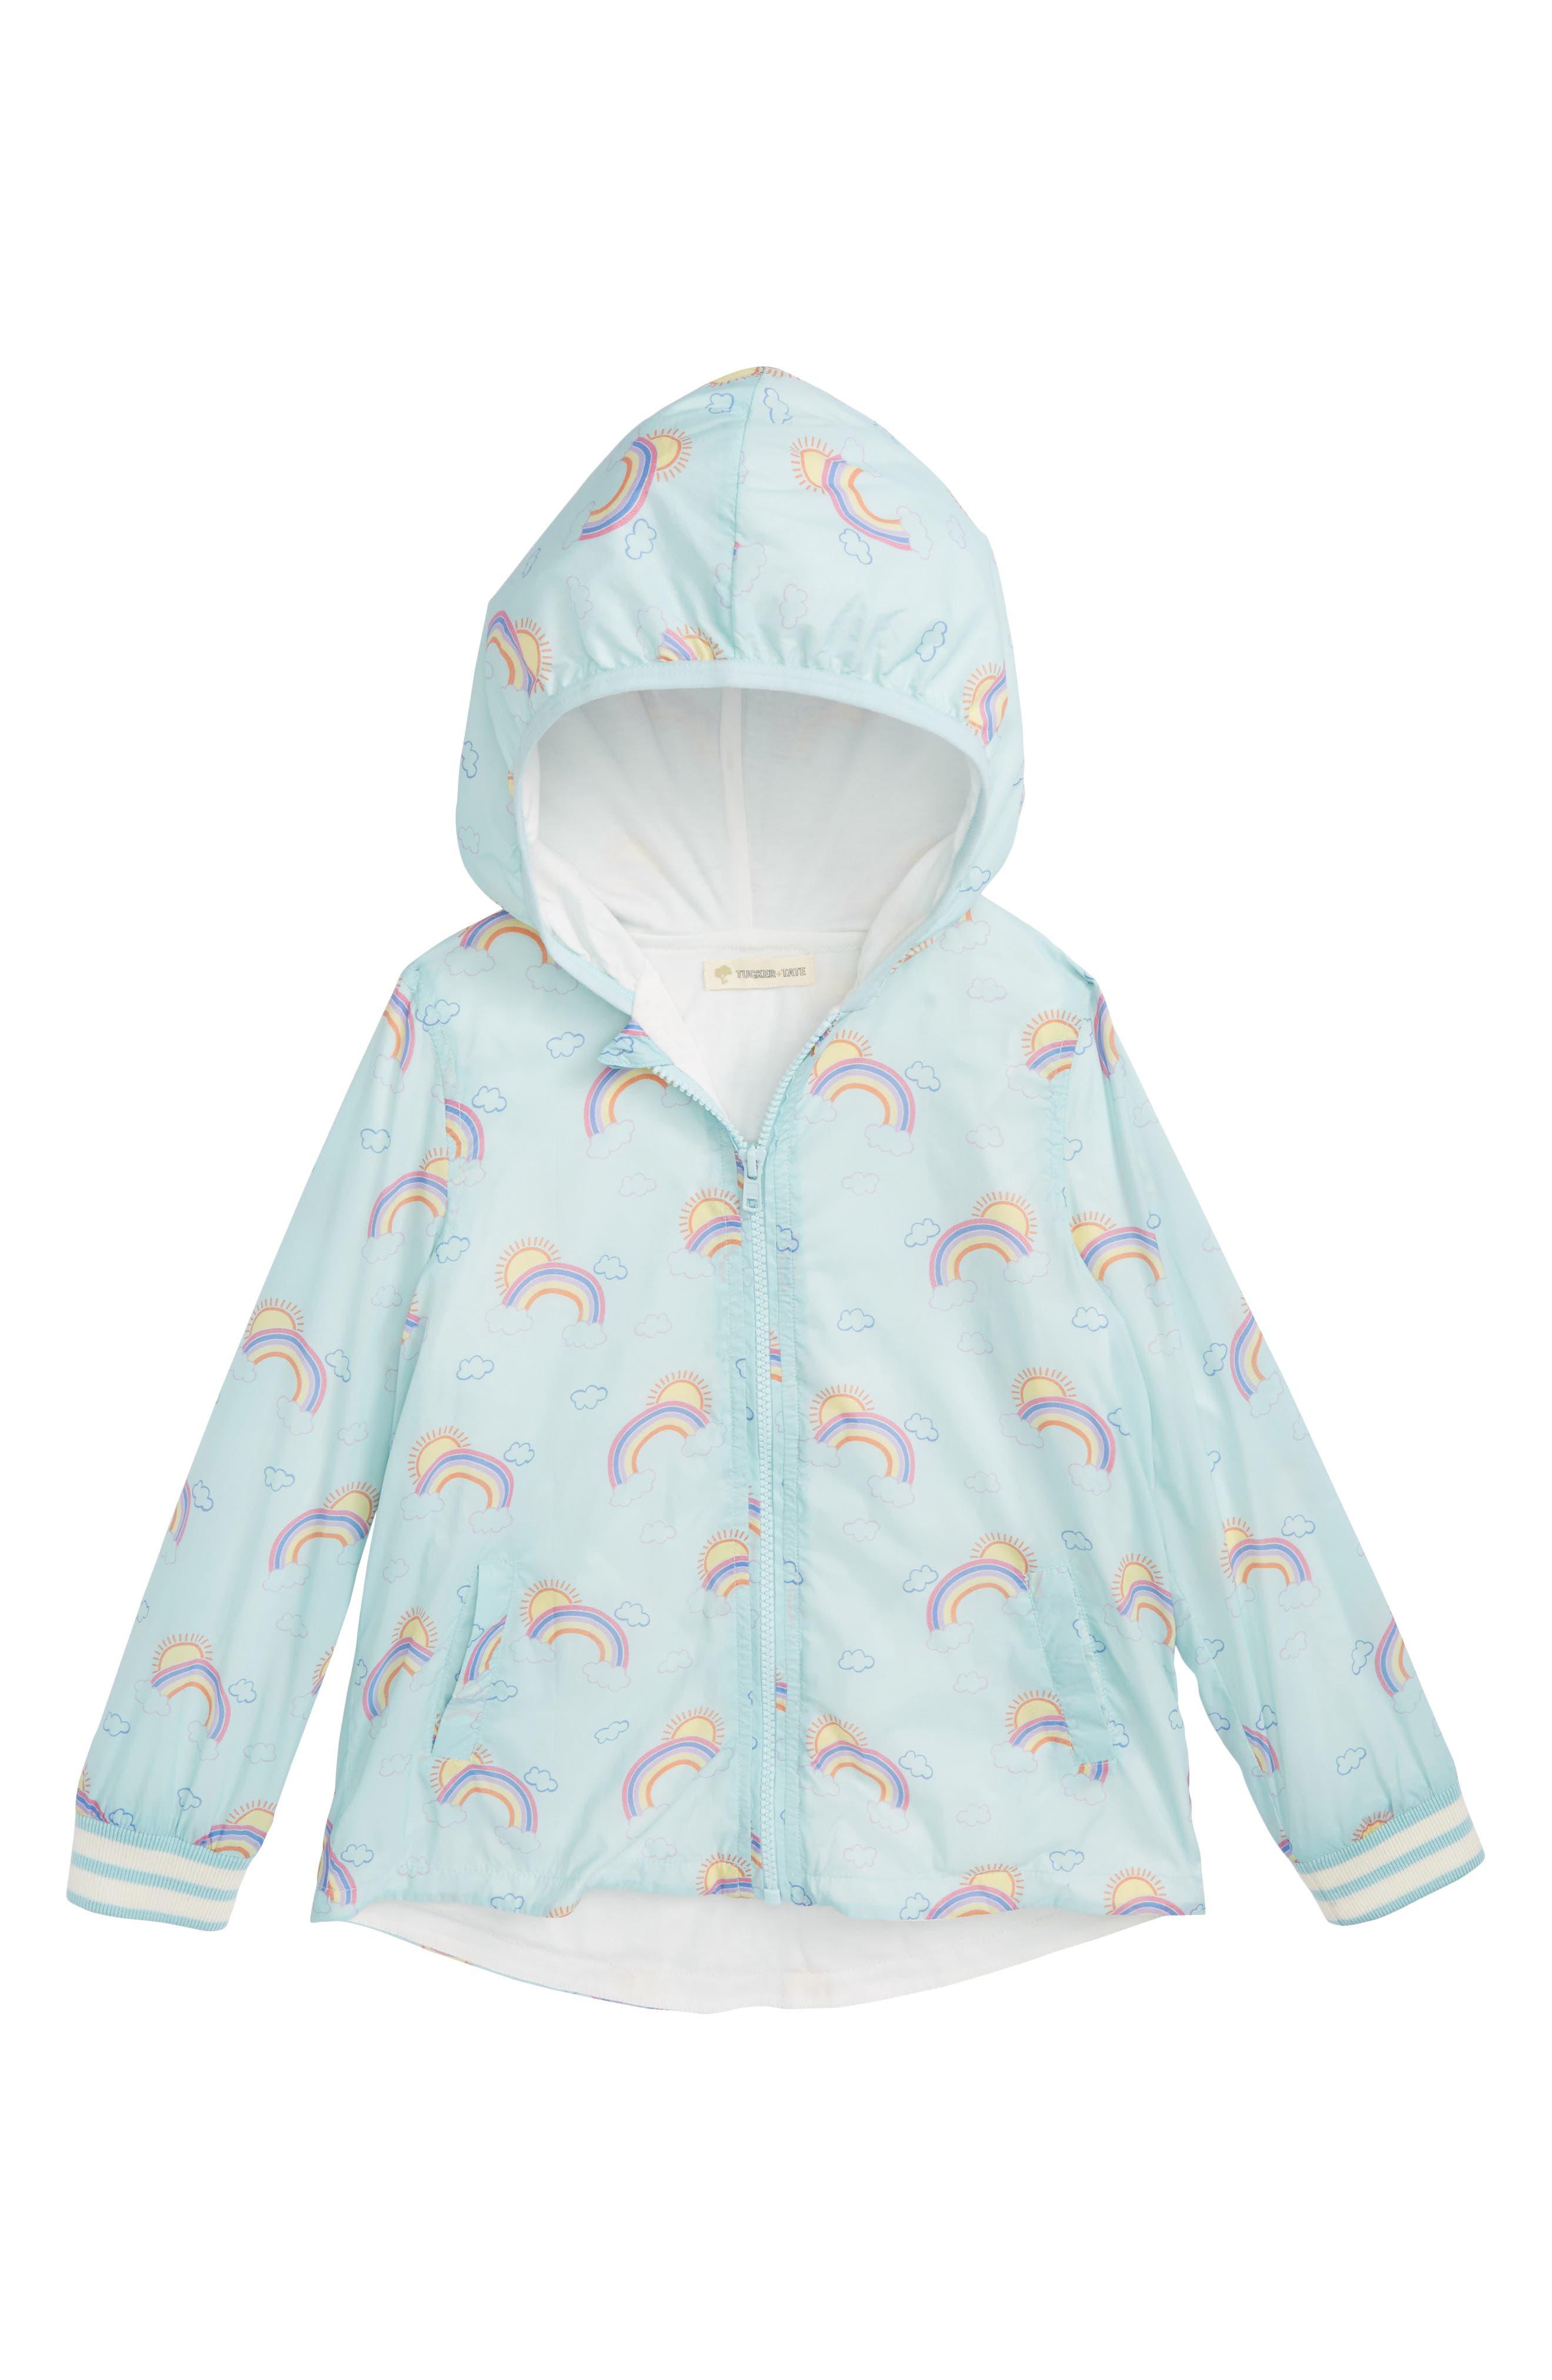 Tucker + Tate Rainbow Print Hooded Jacket (Toddler Girls, Little Girls & Big Girls)